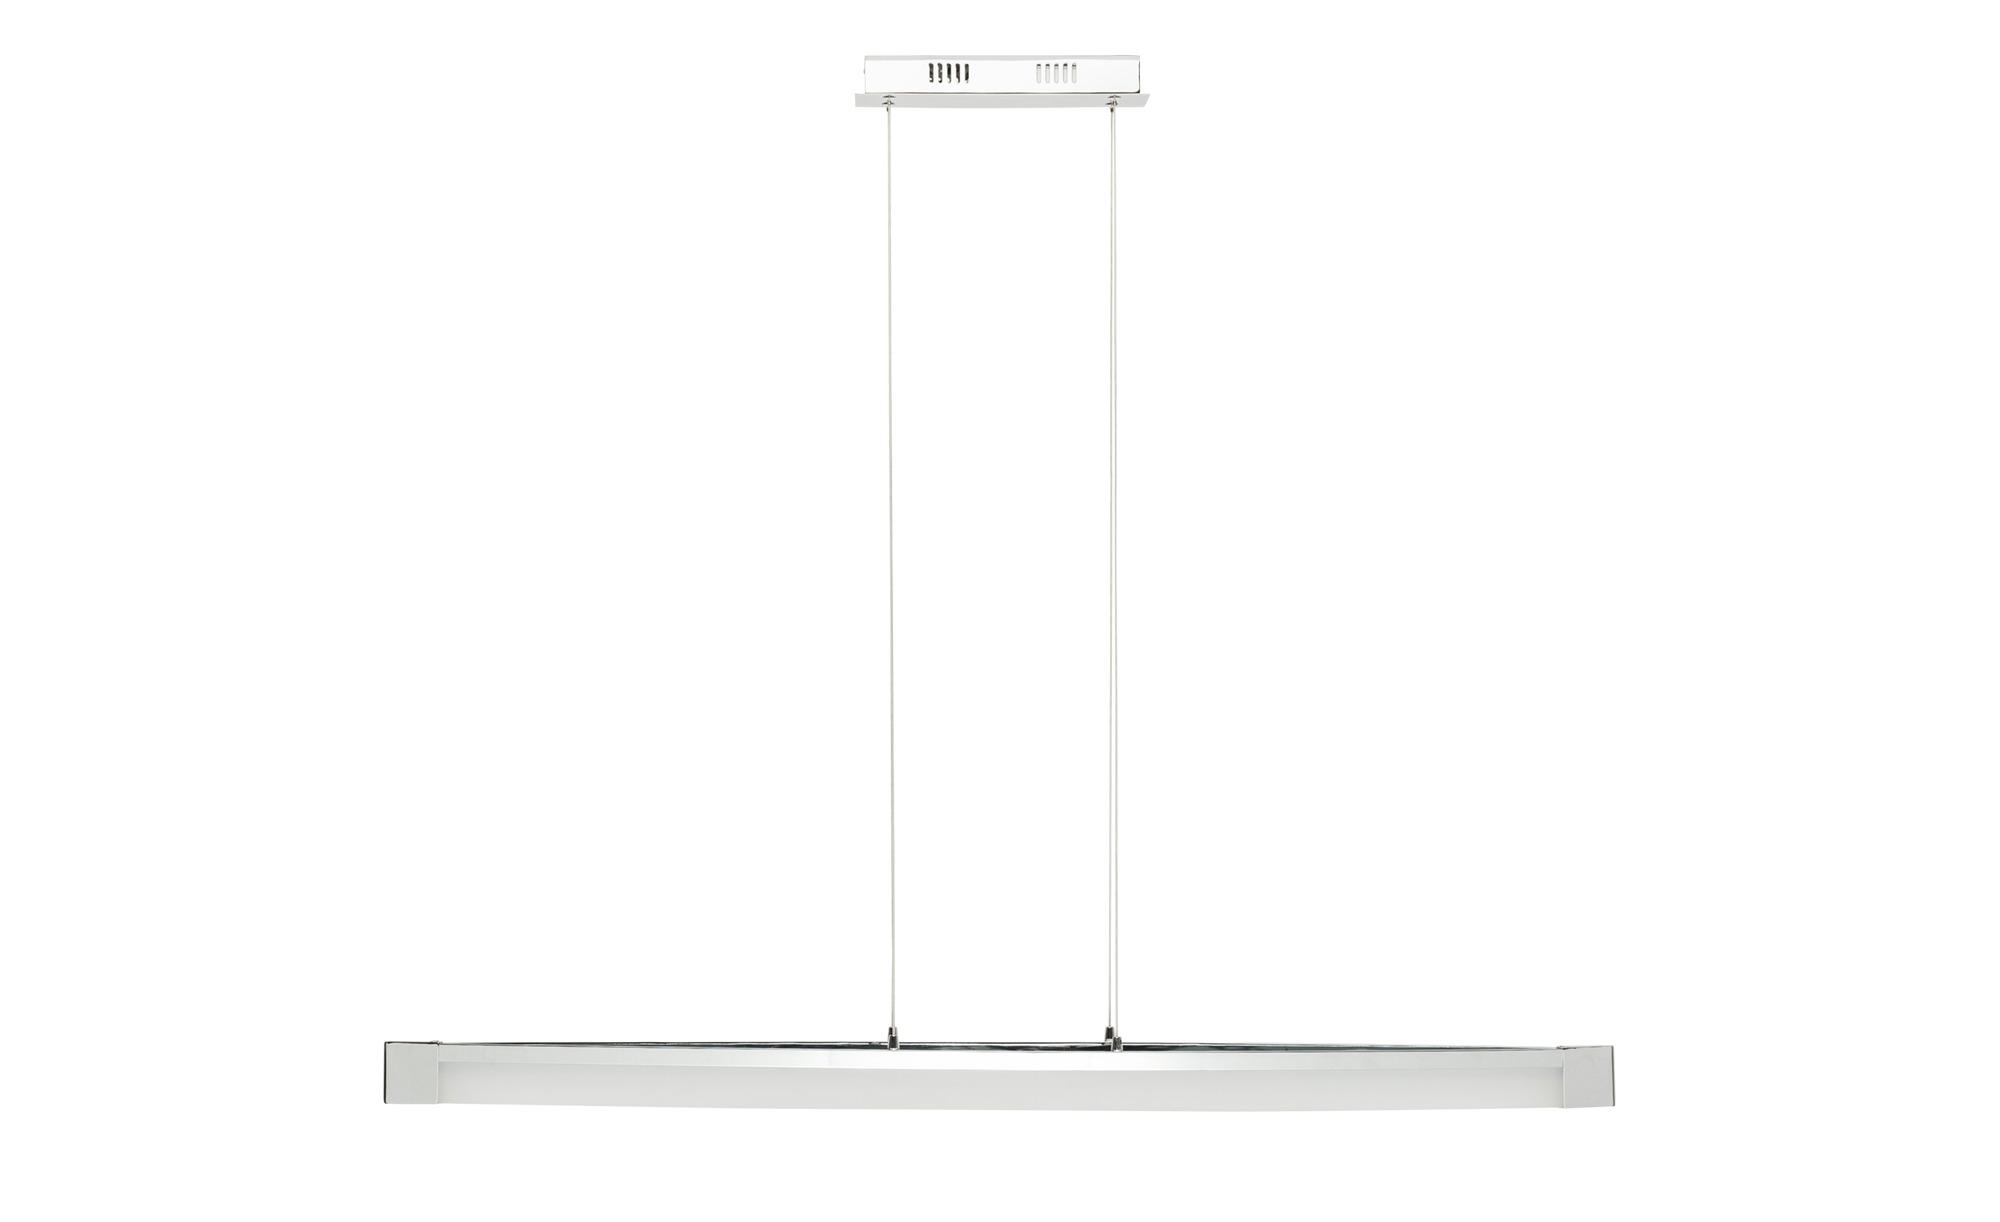 Wofi LED-Pendelleuchte chrom ¦ silber ¦ Maße (cm): B: 14,5 H: 150 Lampen & Leuchten > LED-Leuchten > LED-Pendelleuchten - Höffner